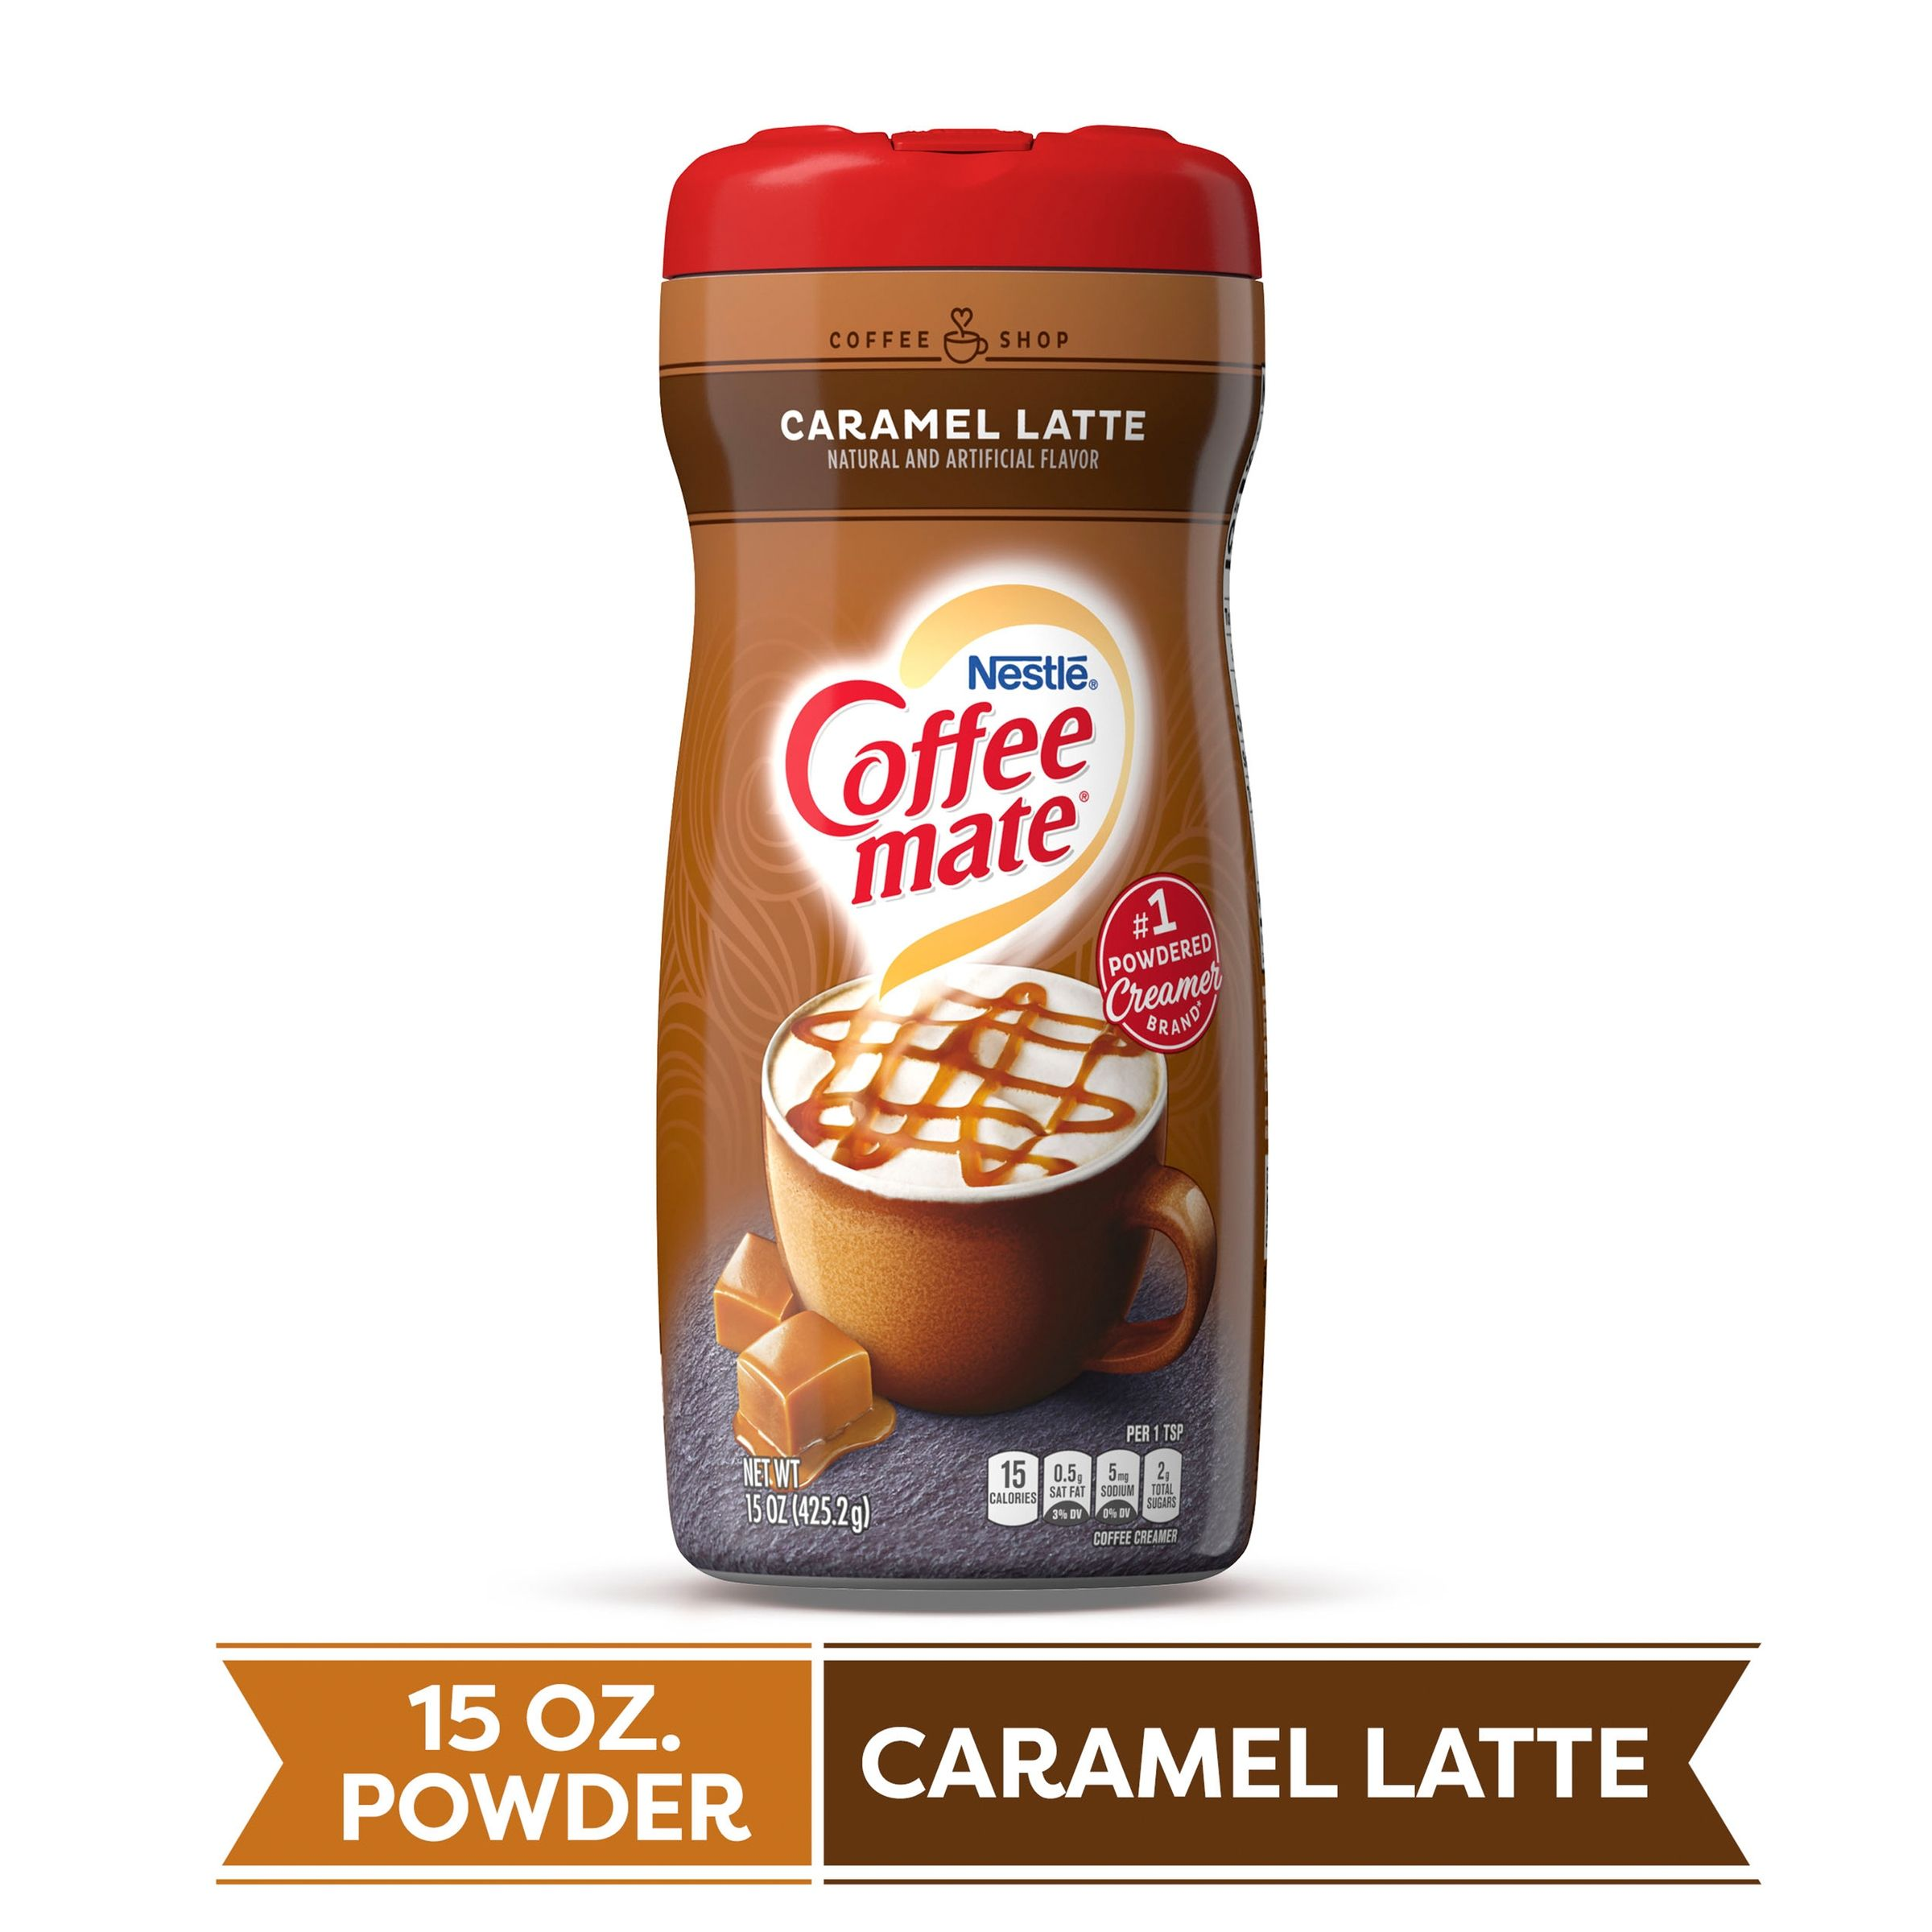 COFFEE MATE Caramel Latte Powder Coffee Creamer 15 Oz